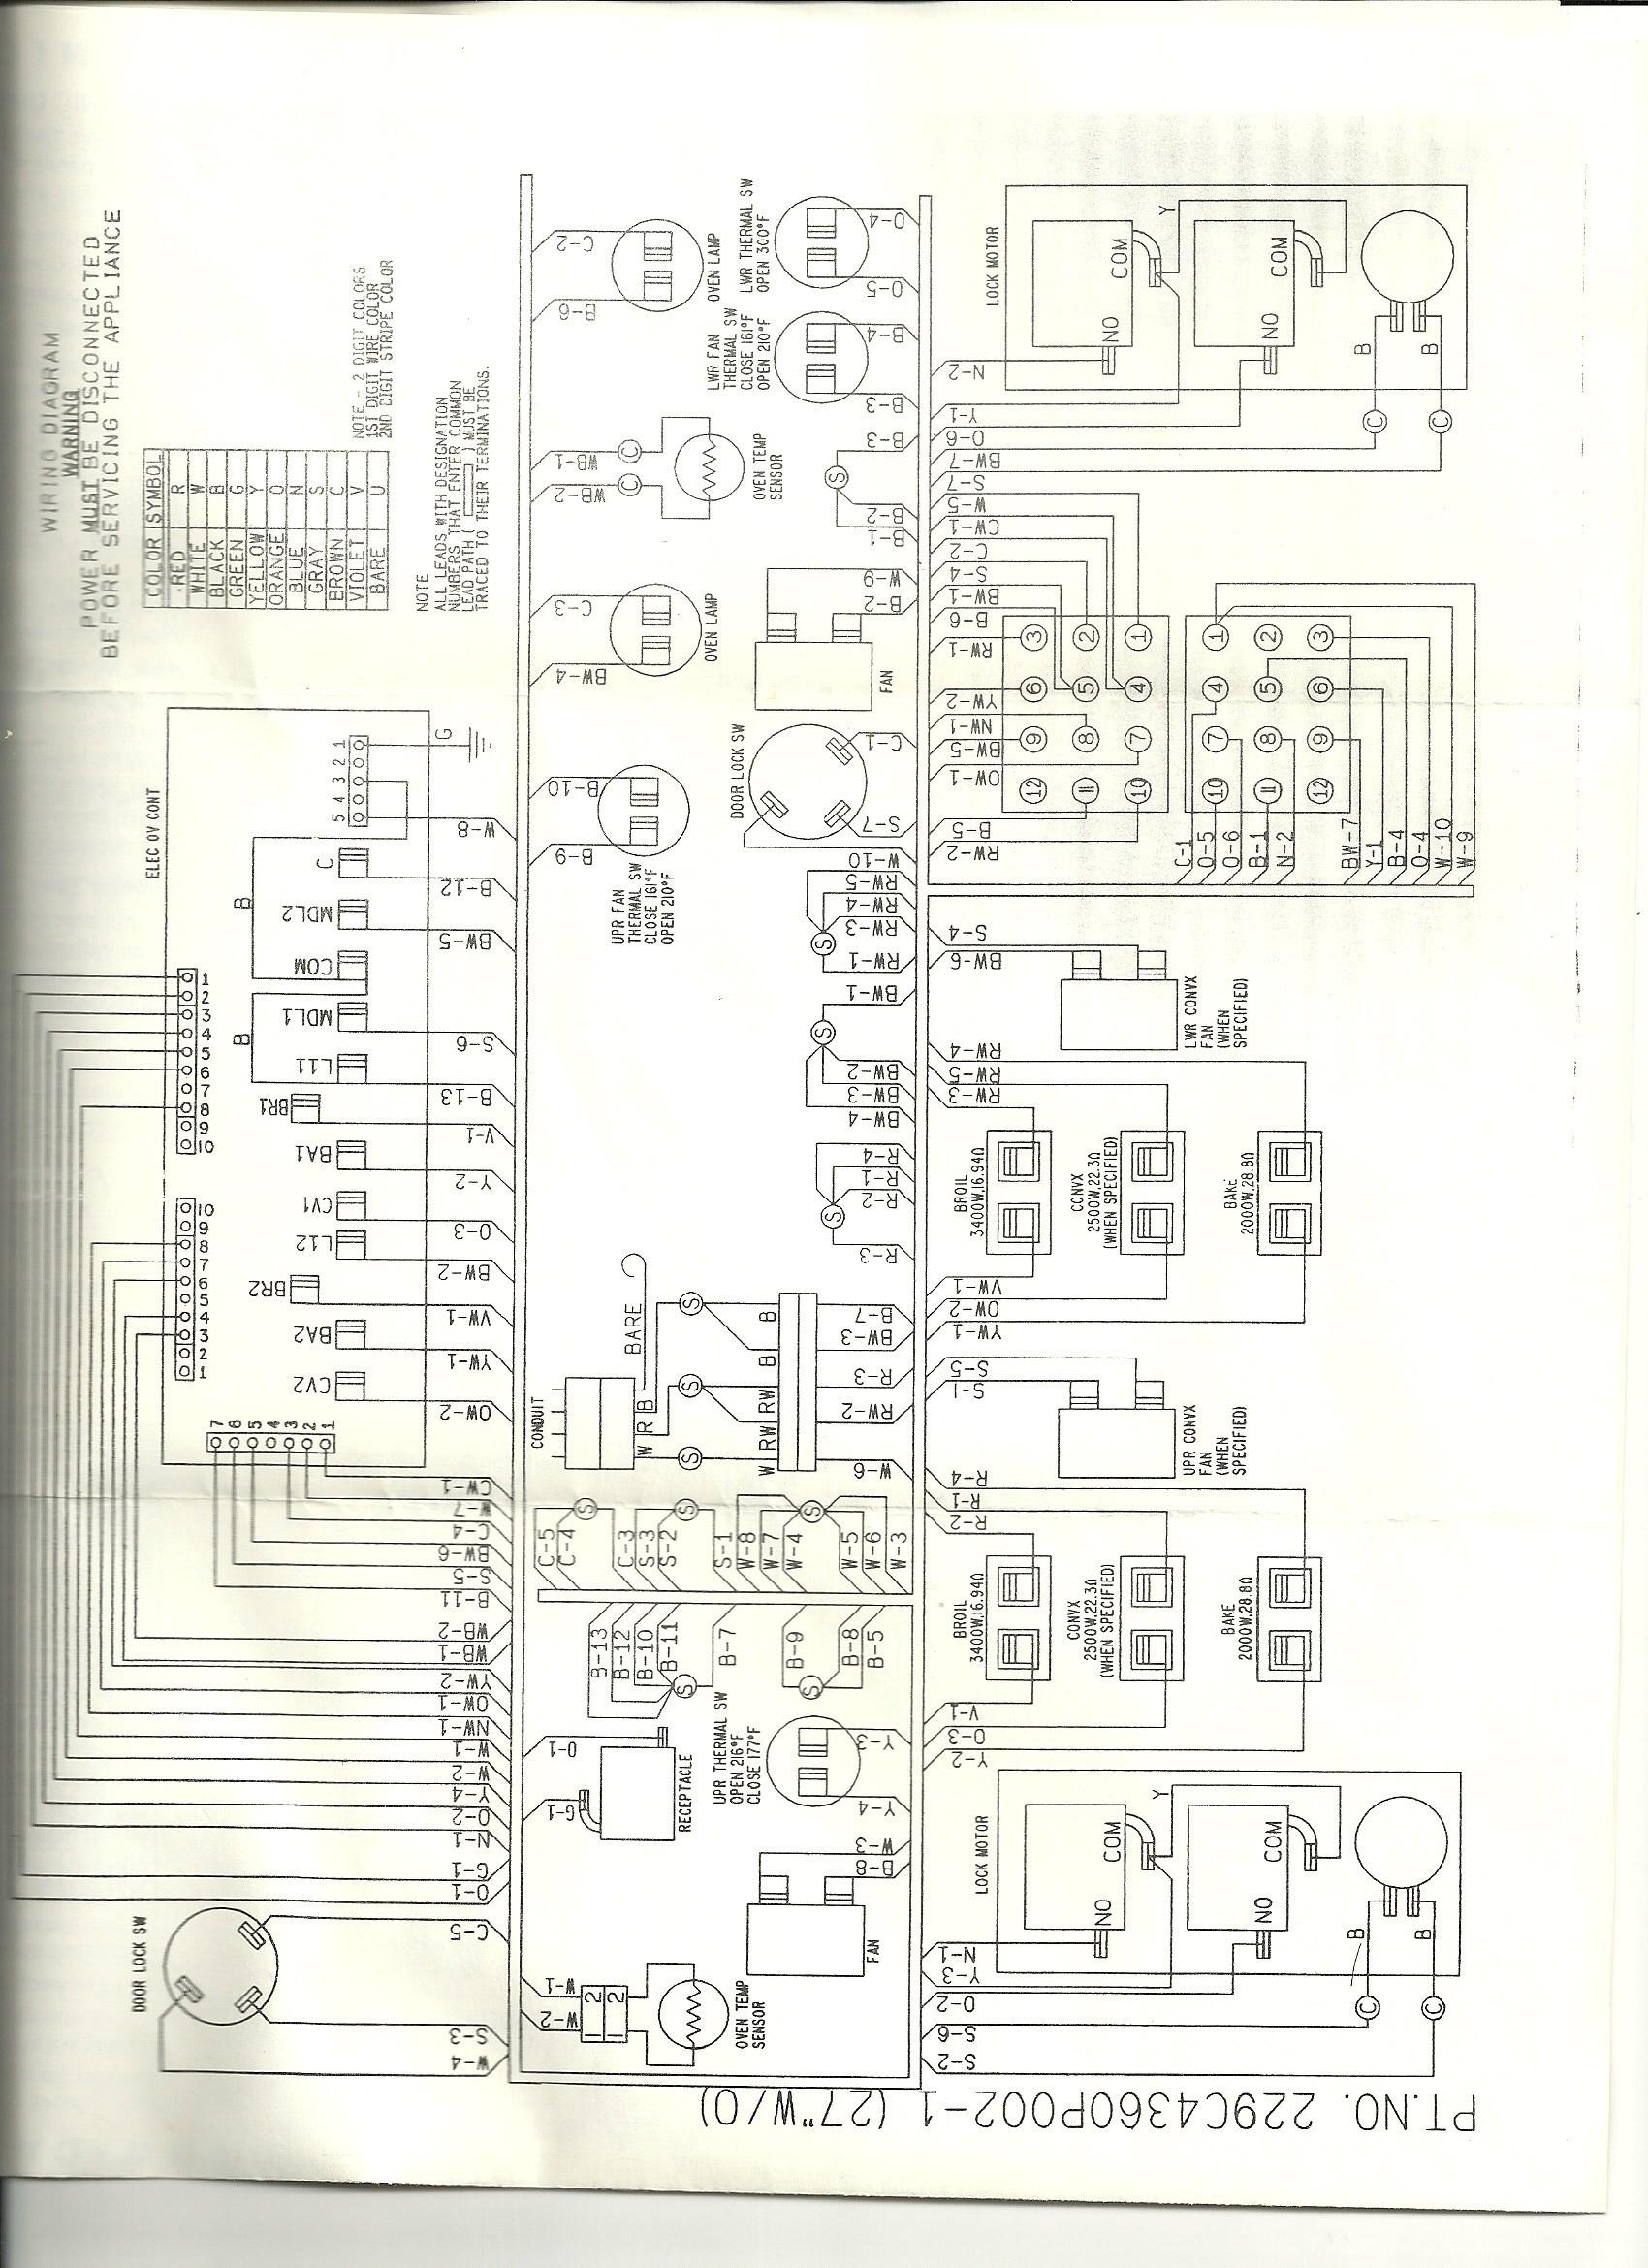 ge refrigerator wiring diagram directv swm lnb stove schematic data oven profile cooktop